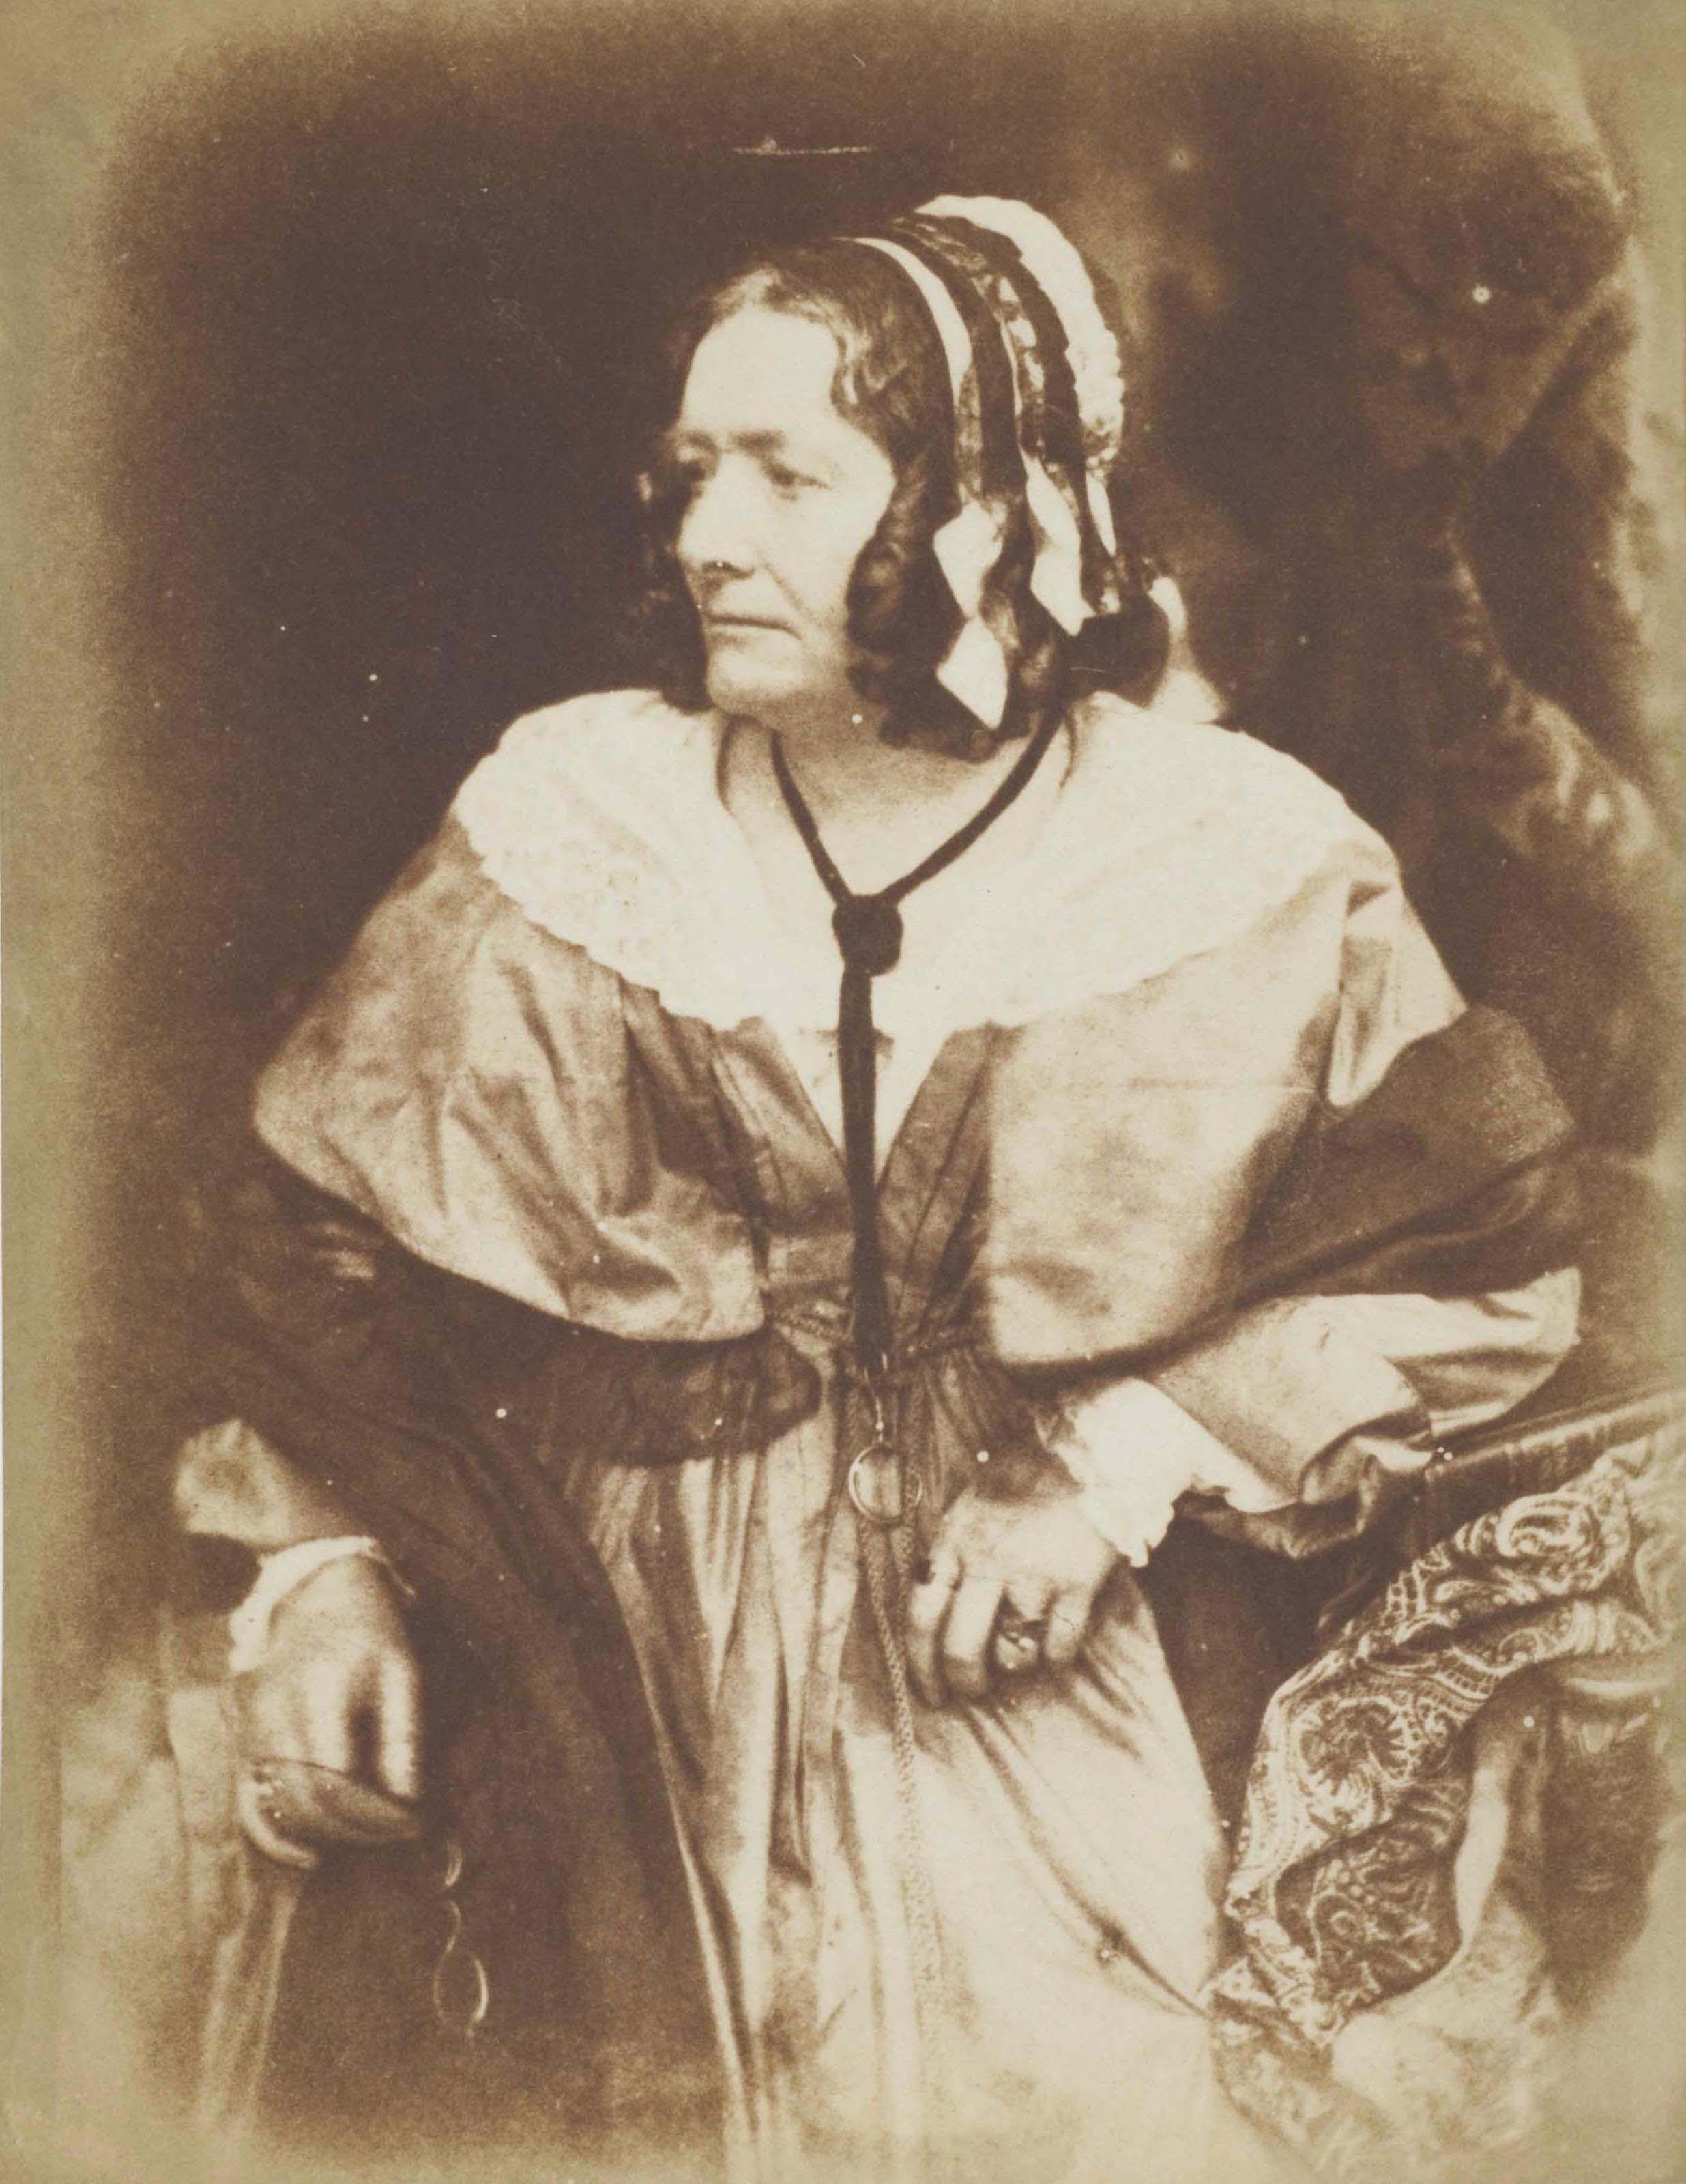 Mrs. Anna (Brownell Murphy) Jameson, Art Historian and Essayist, circa 1845